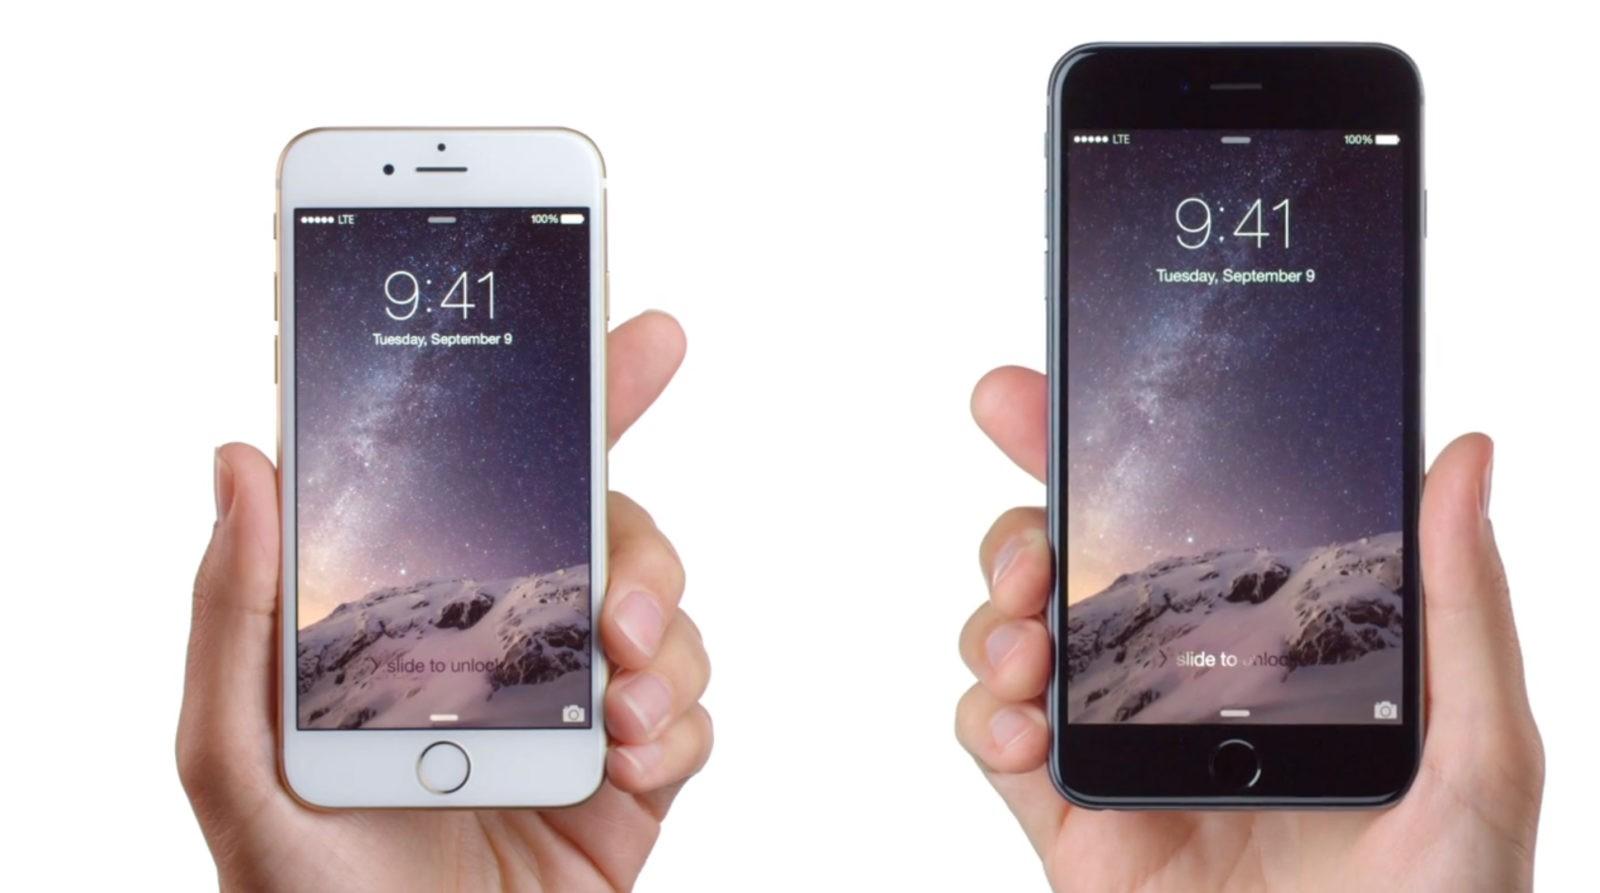 Apple-ի մարքեթինգը՝ հզոր ուժ